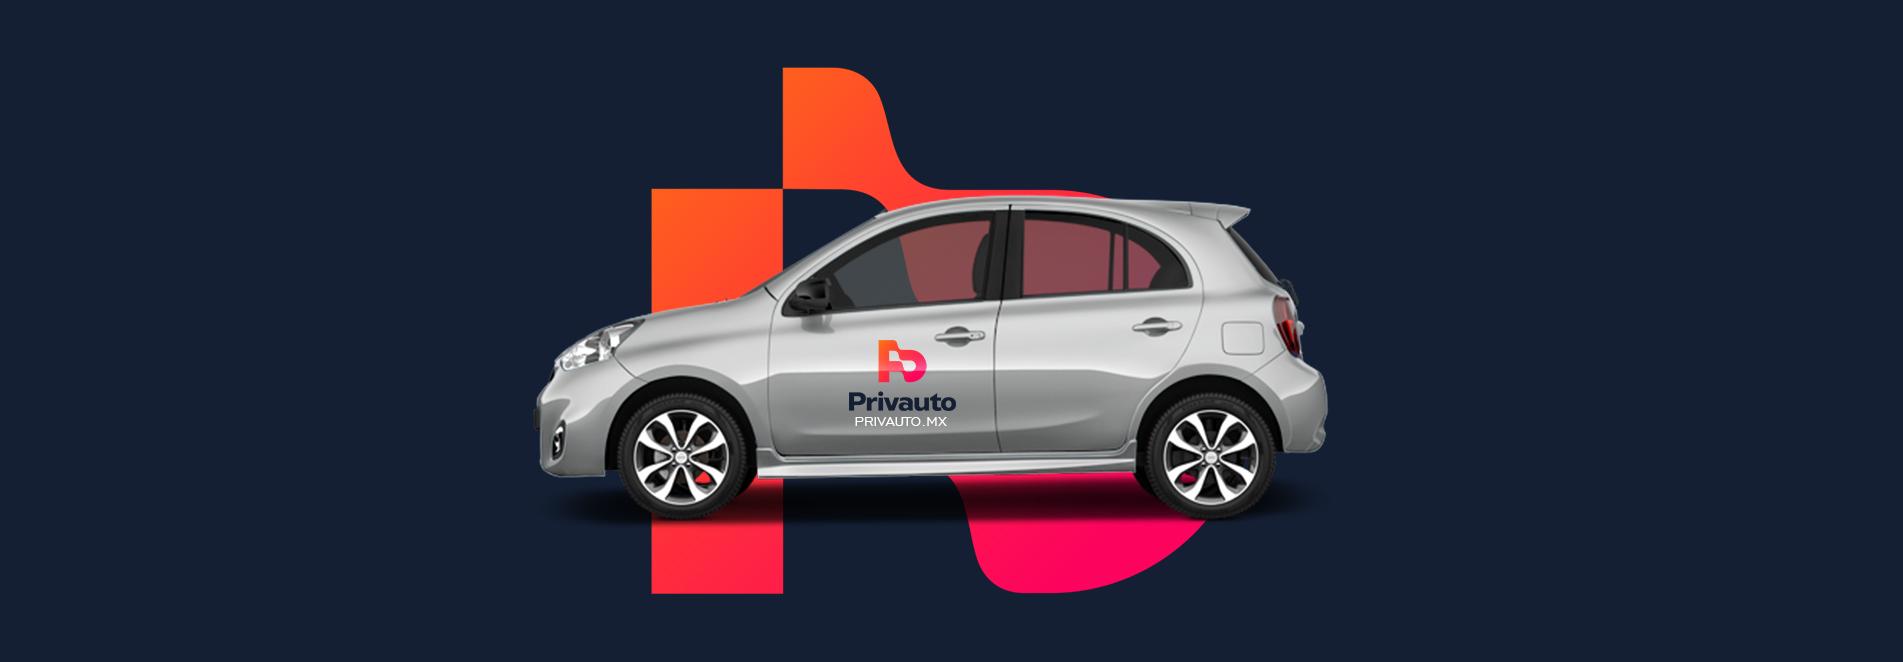 Imagen de auto Privauto